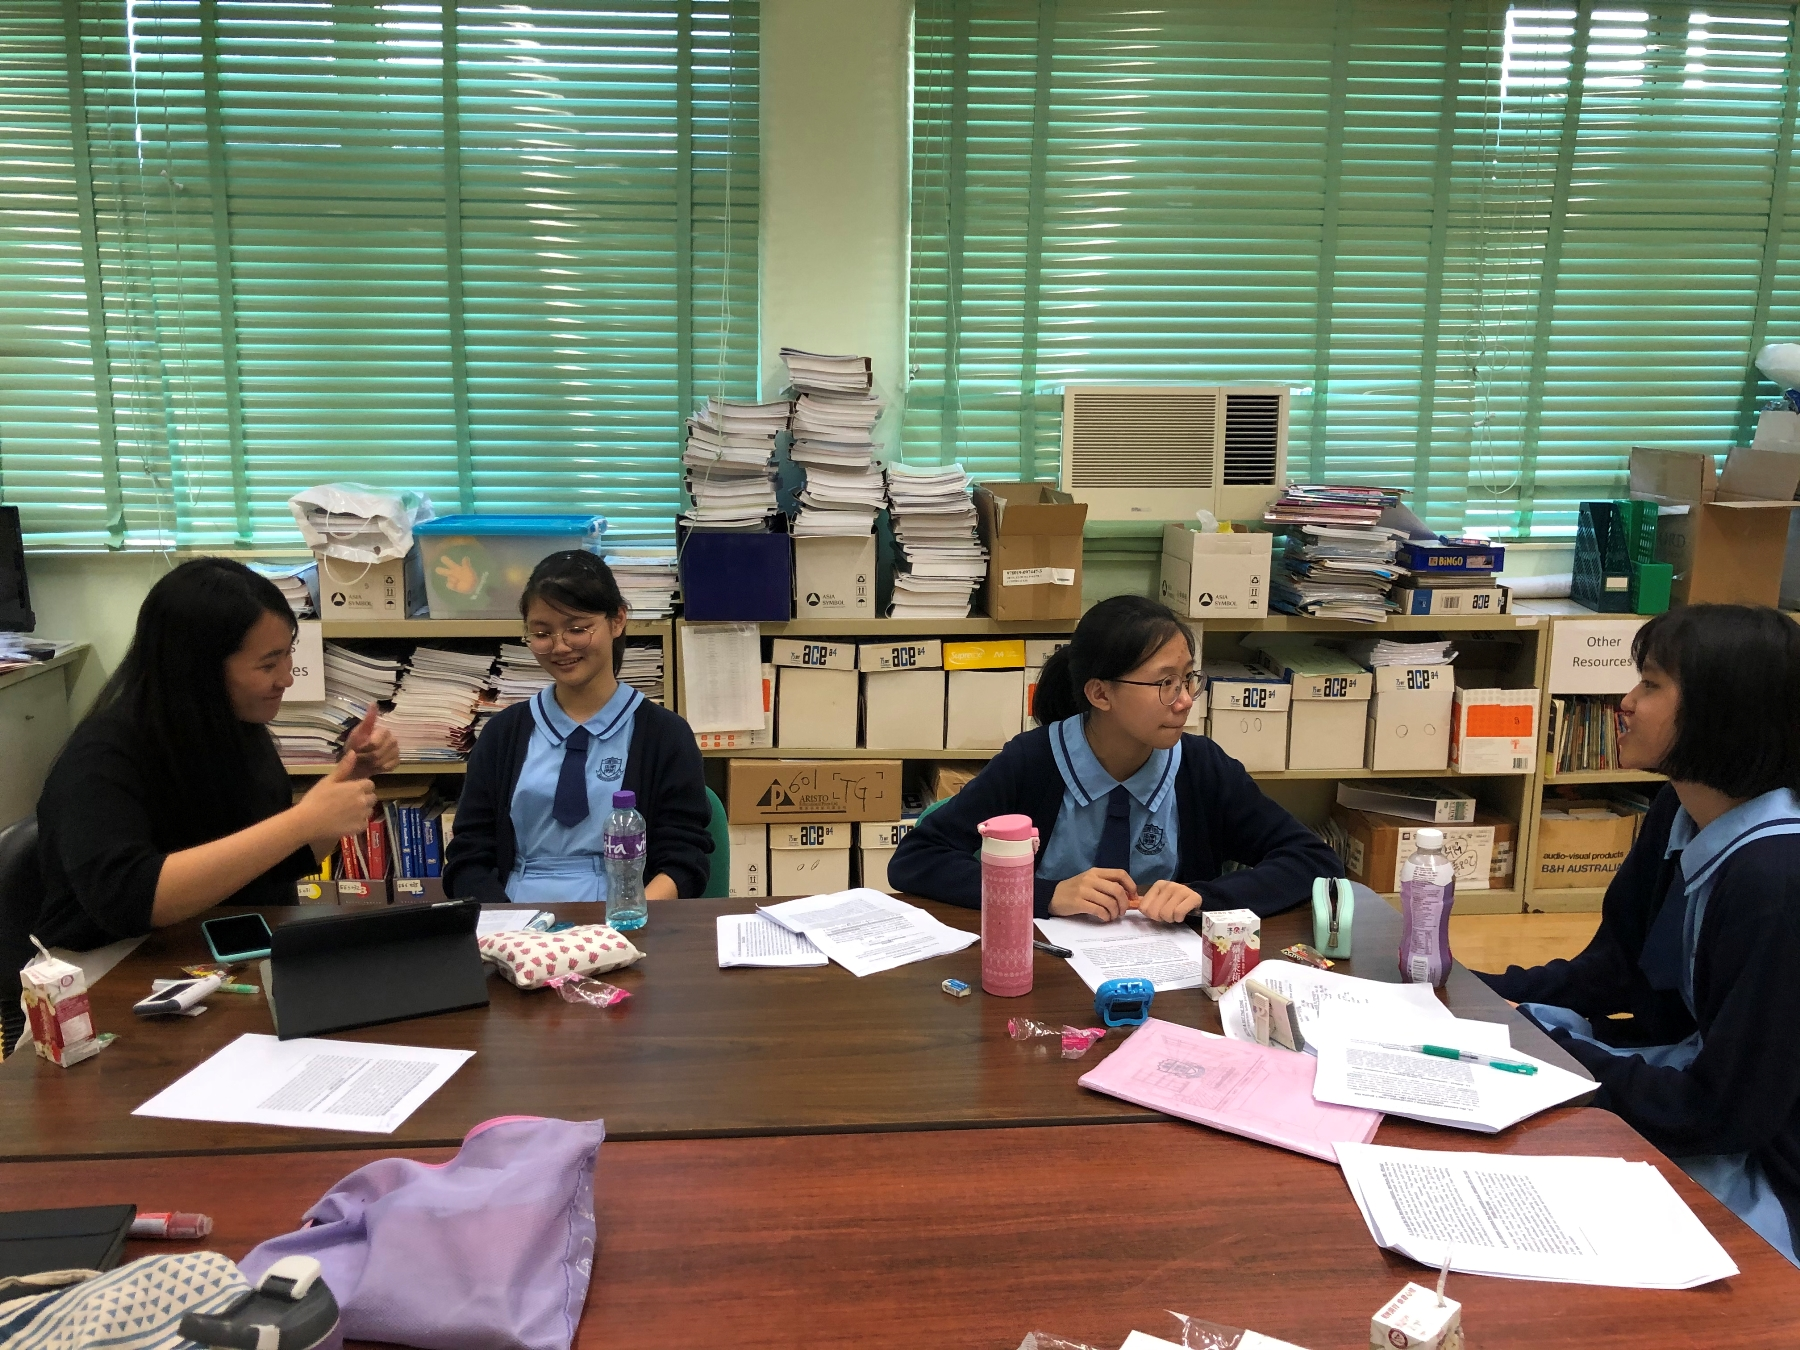 http://npc.edu.hk/sites/default/files/image1.jpeg